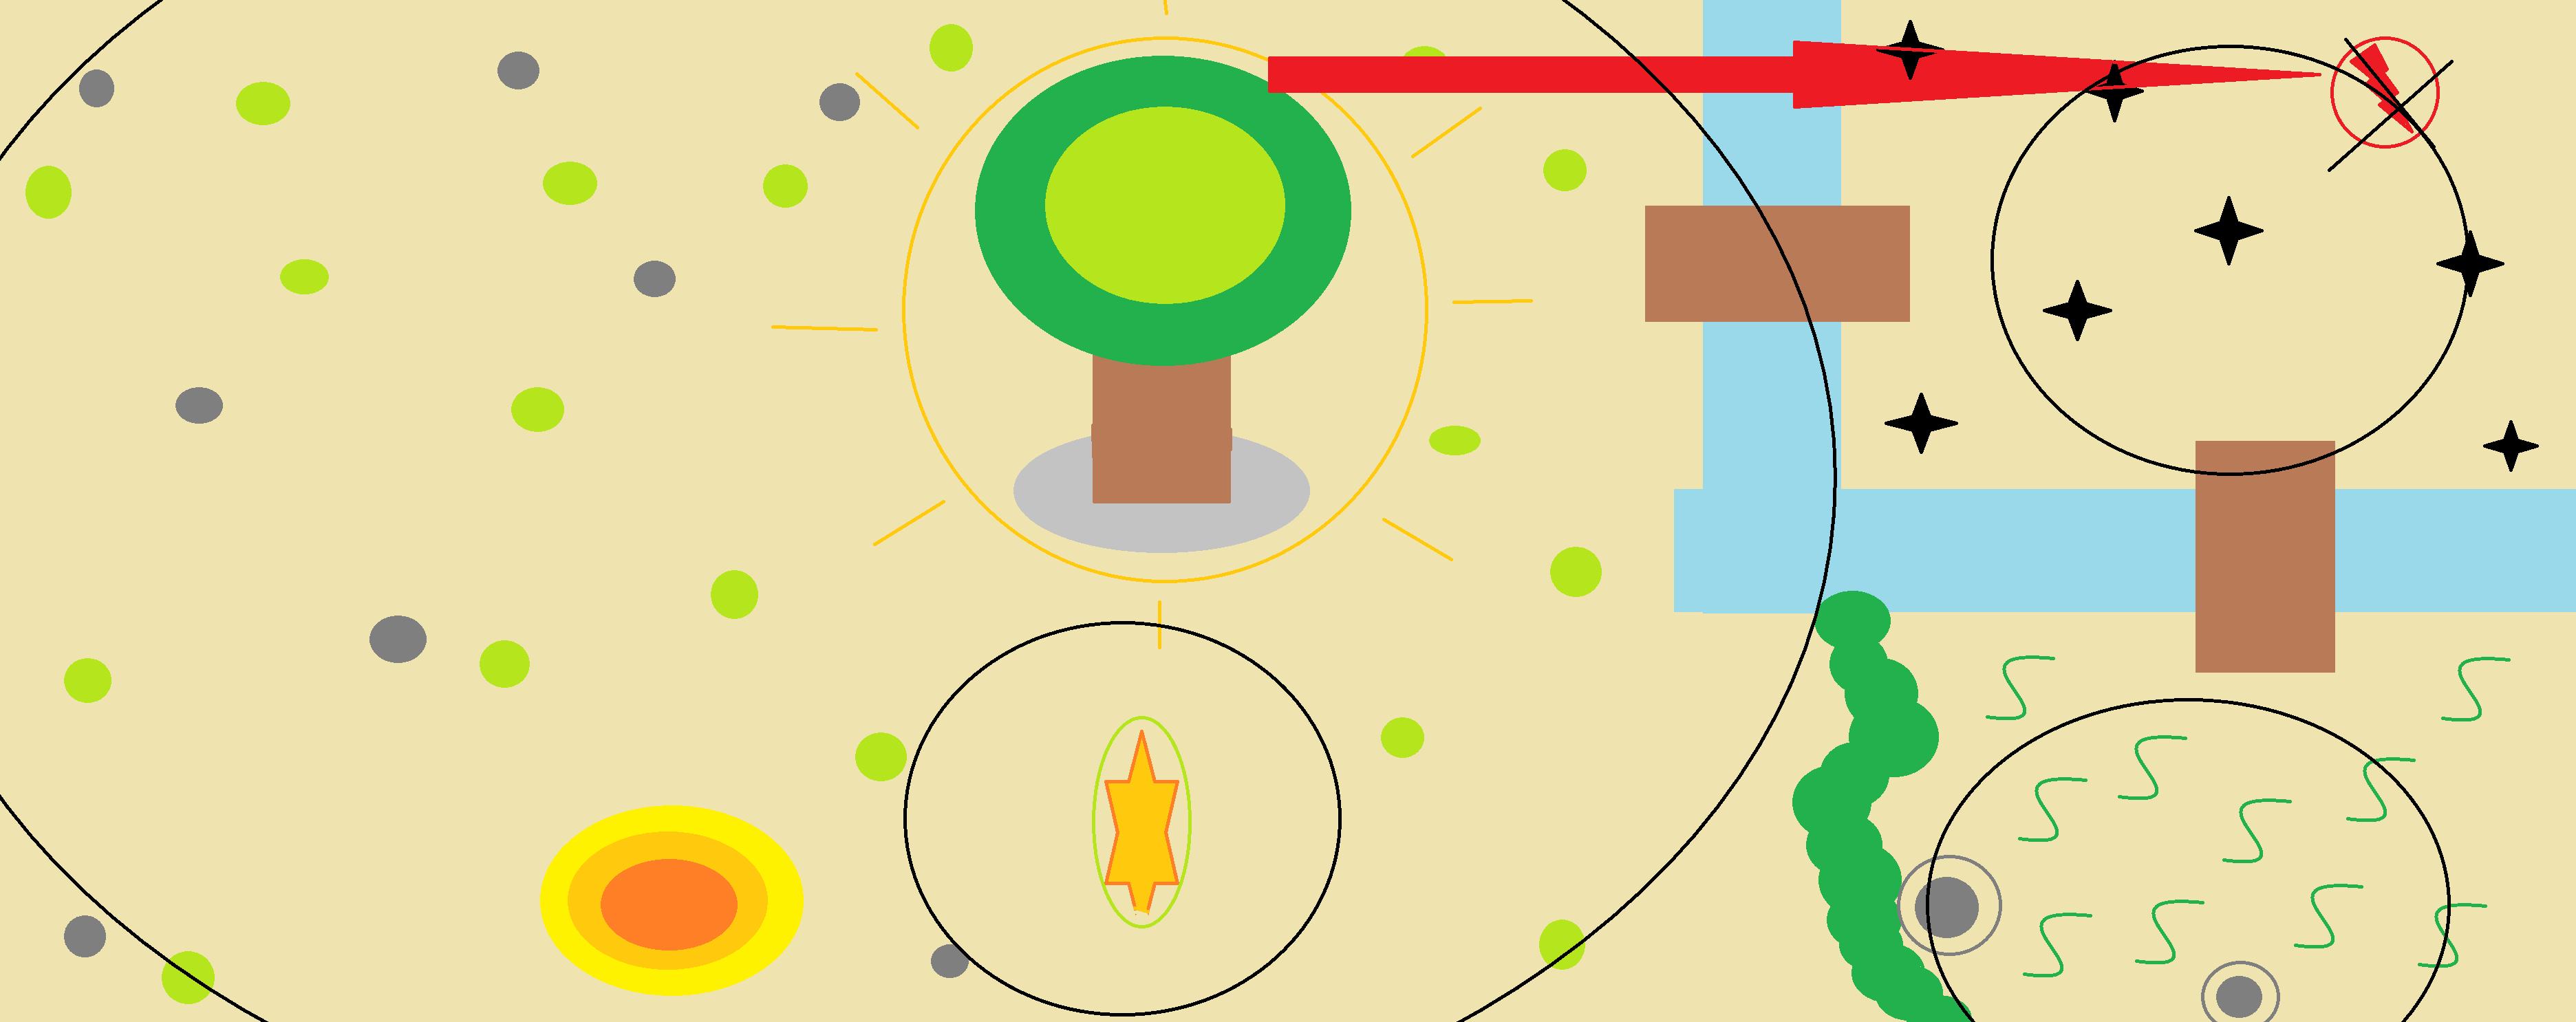 design level base